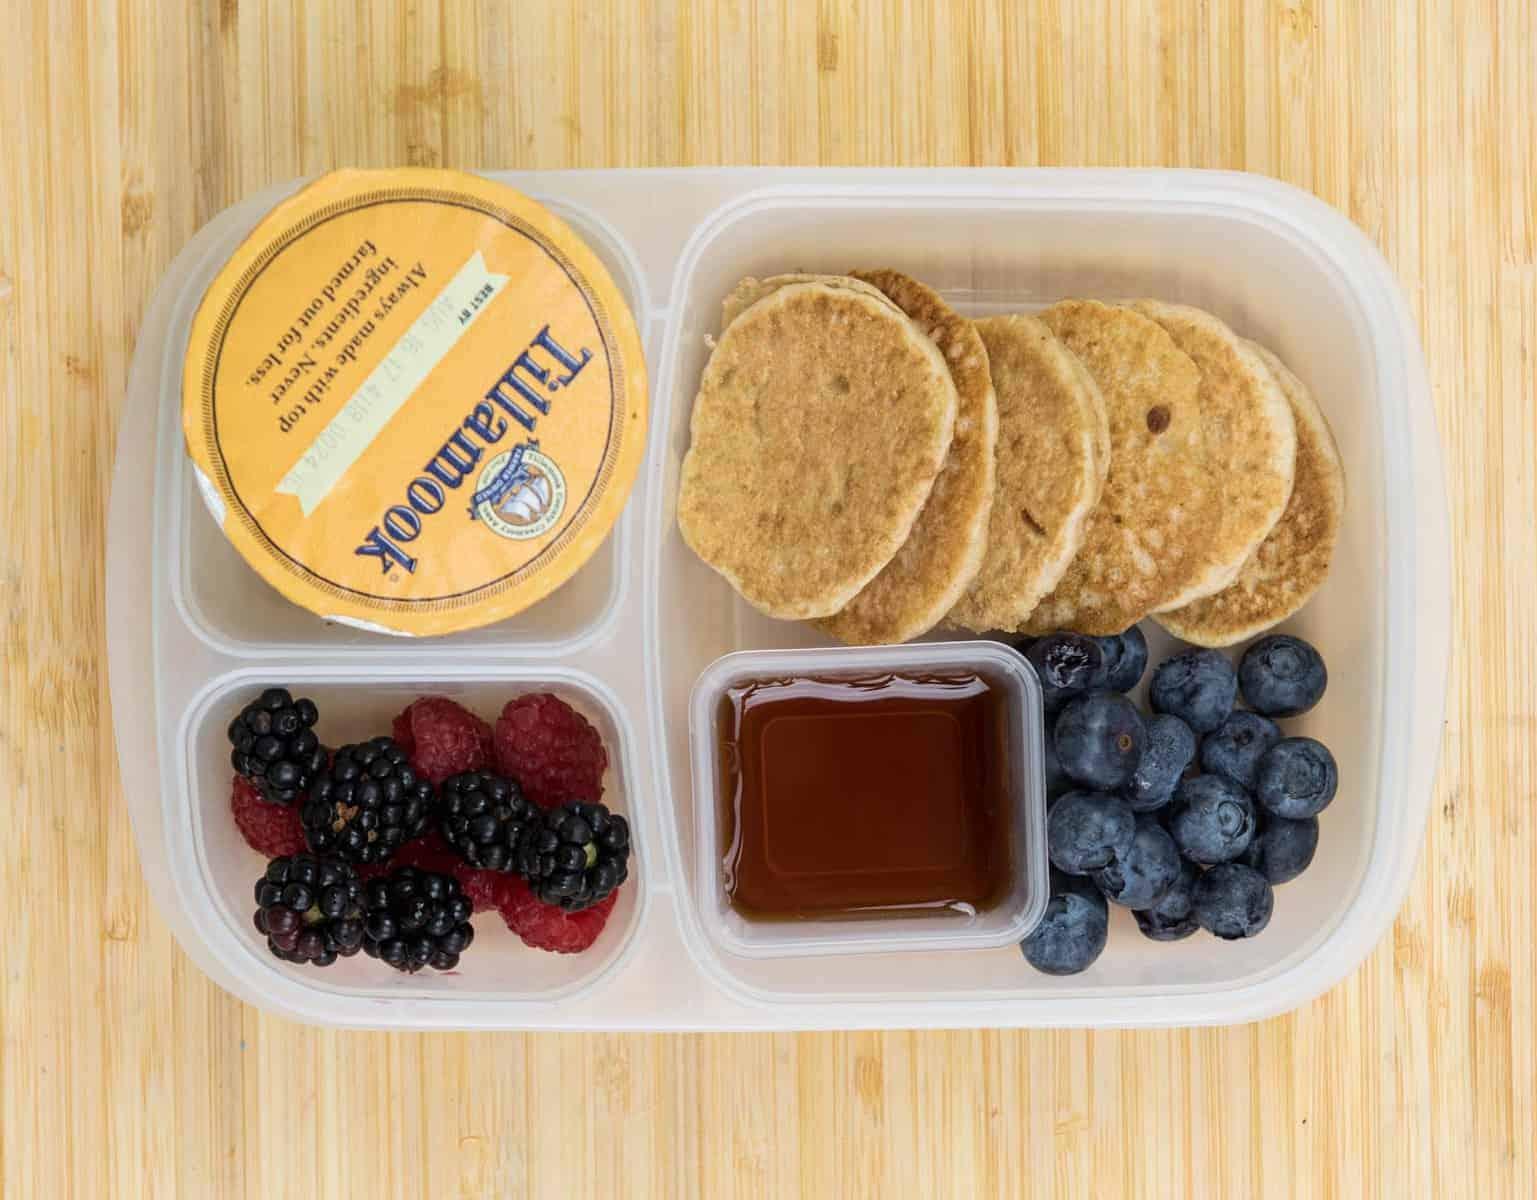 Lunch Box Ideas - Breakfast for Lunch Box